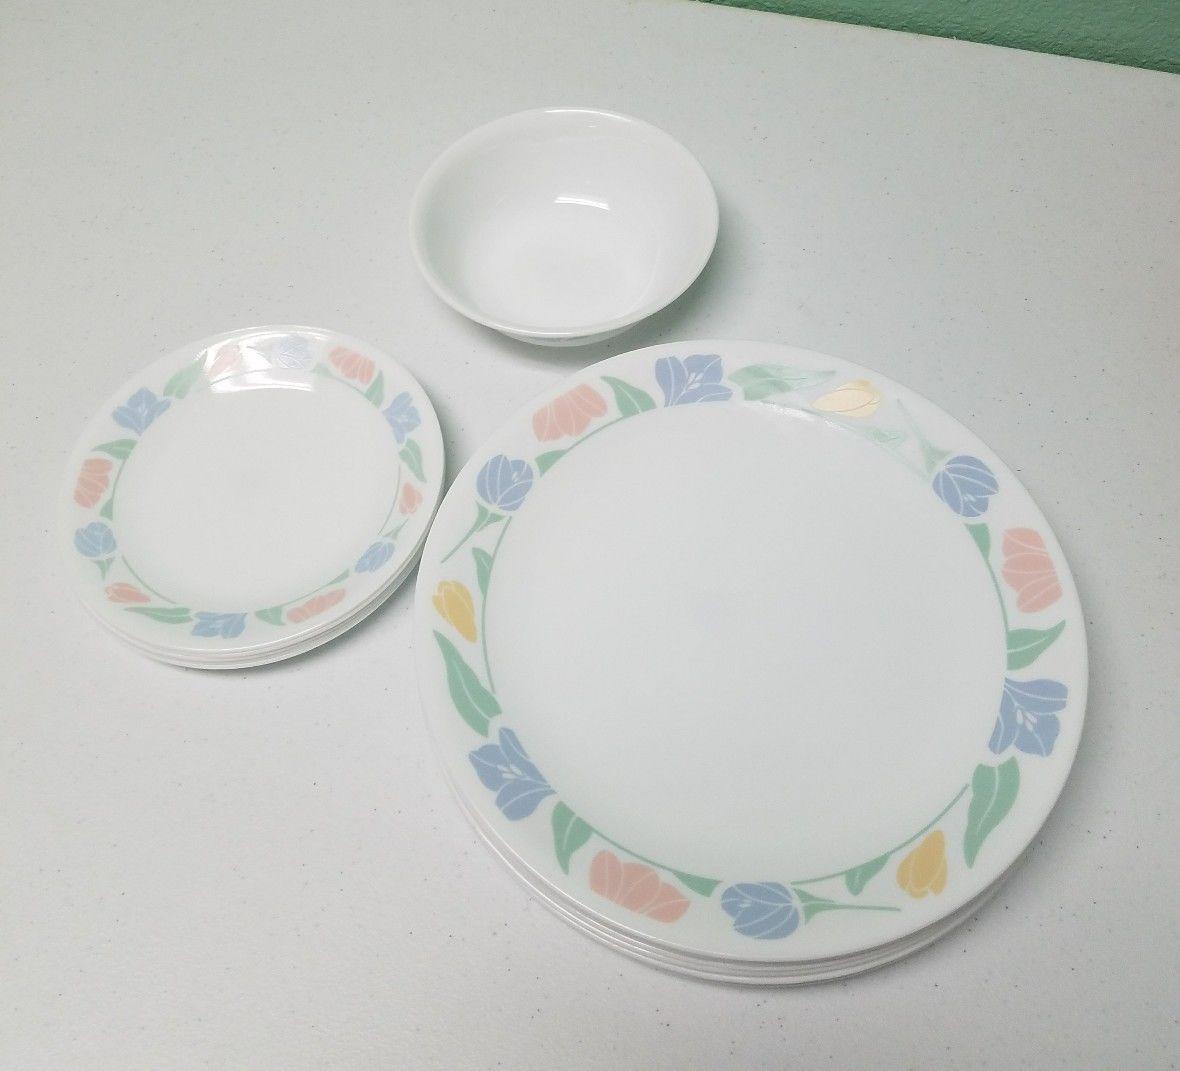 Corelle By Corning Dinnerware Set Vintage usa AH & Corelle By Corning Dinnerware Set Vintage and 50 similar items